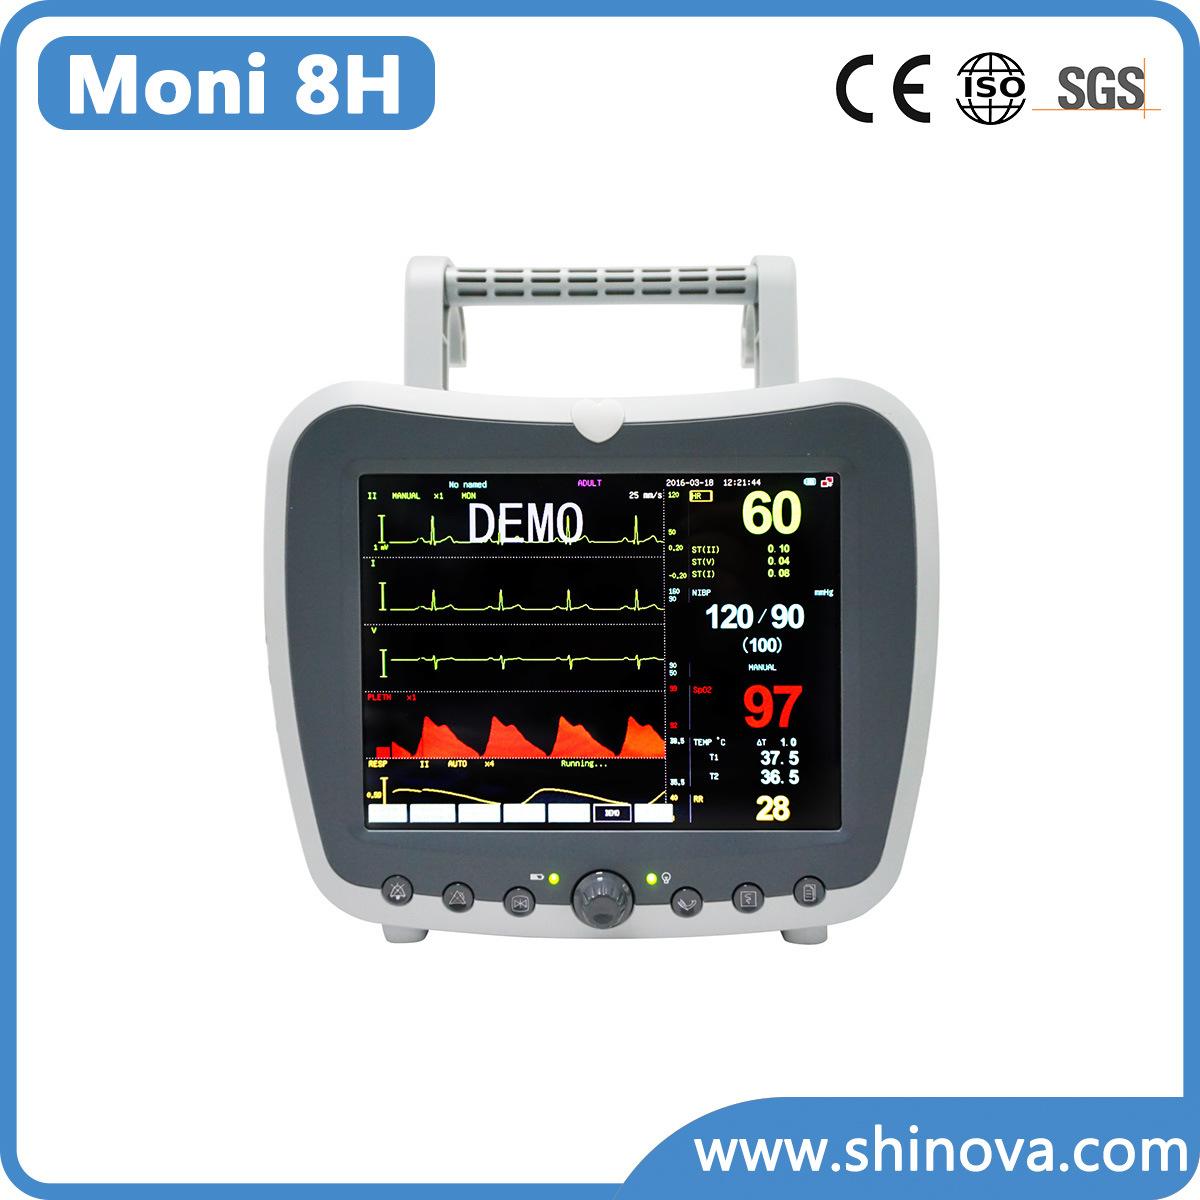 "8.4"" Multi-Parameter Patient Monitor (Moni 8H)"